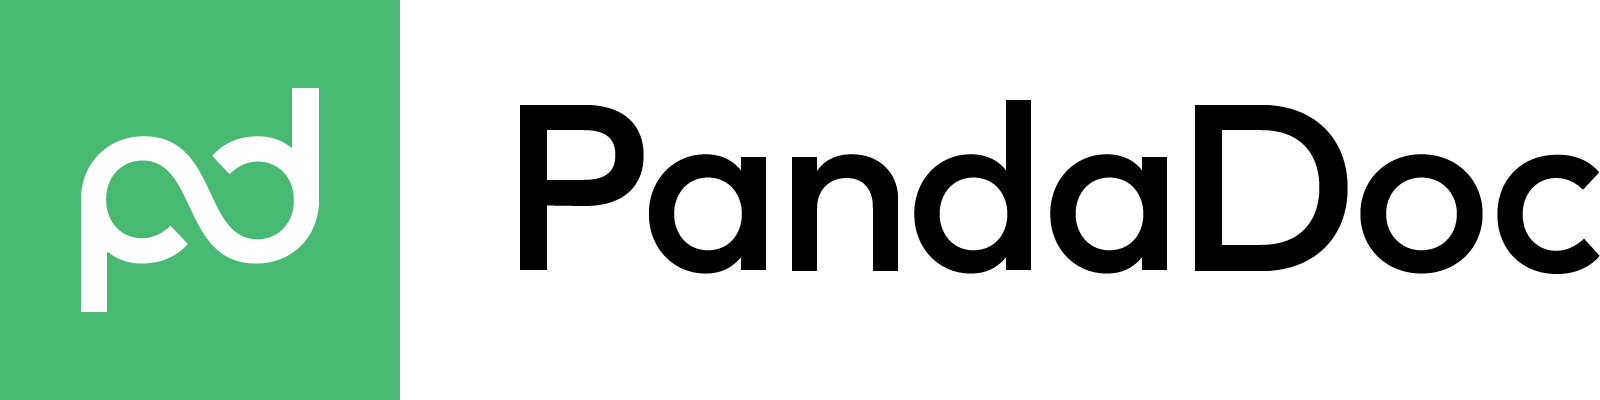 PandaDoc Contracts logo